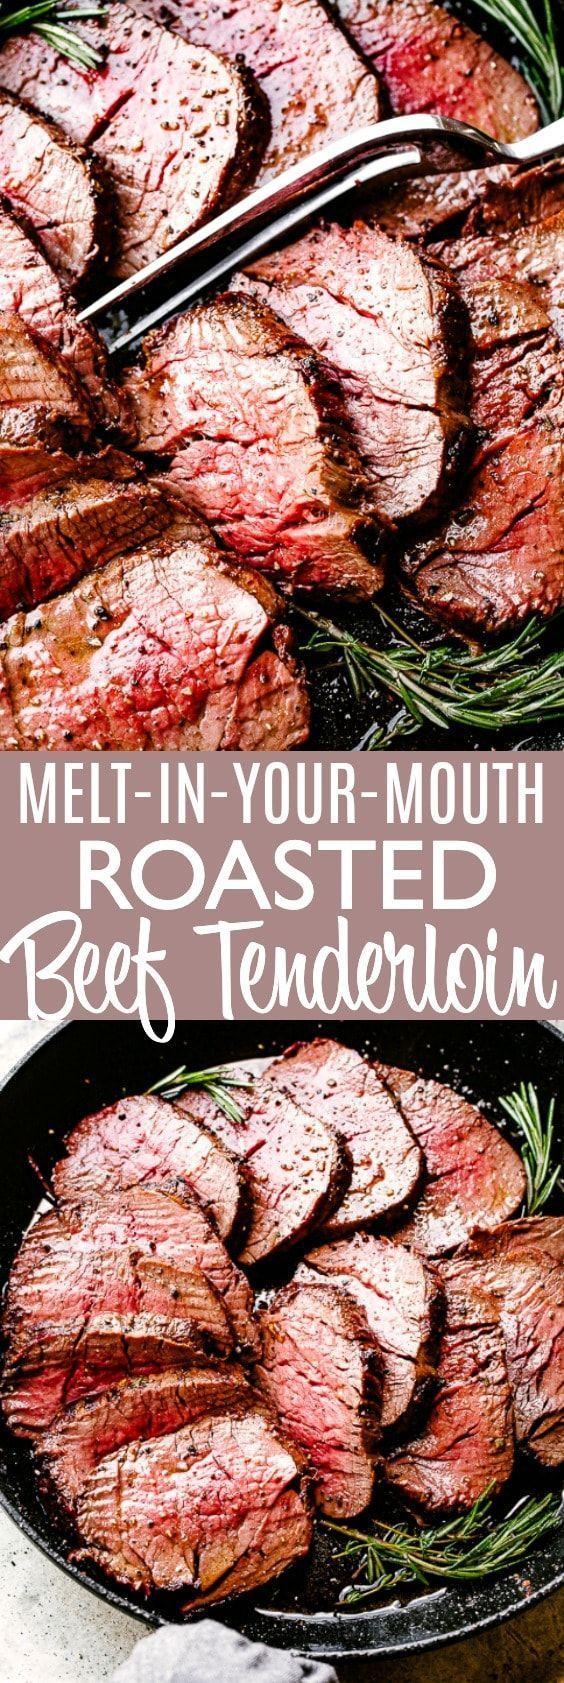 Melt In Your Mouth (MIYM) Roast Beef Tenderloin | BEST Recipe!